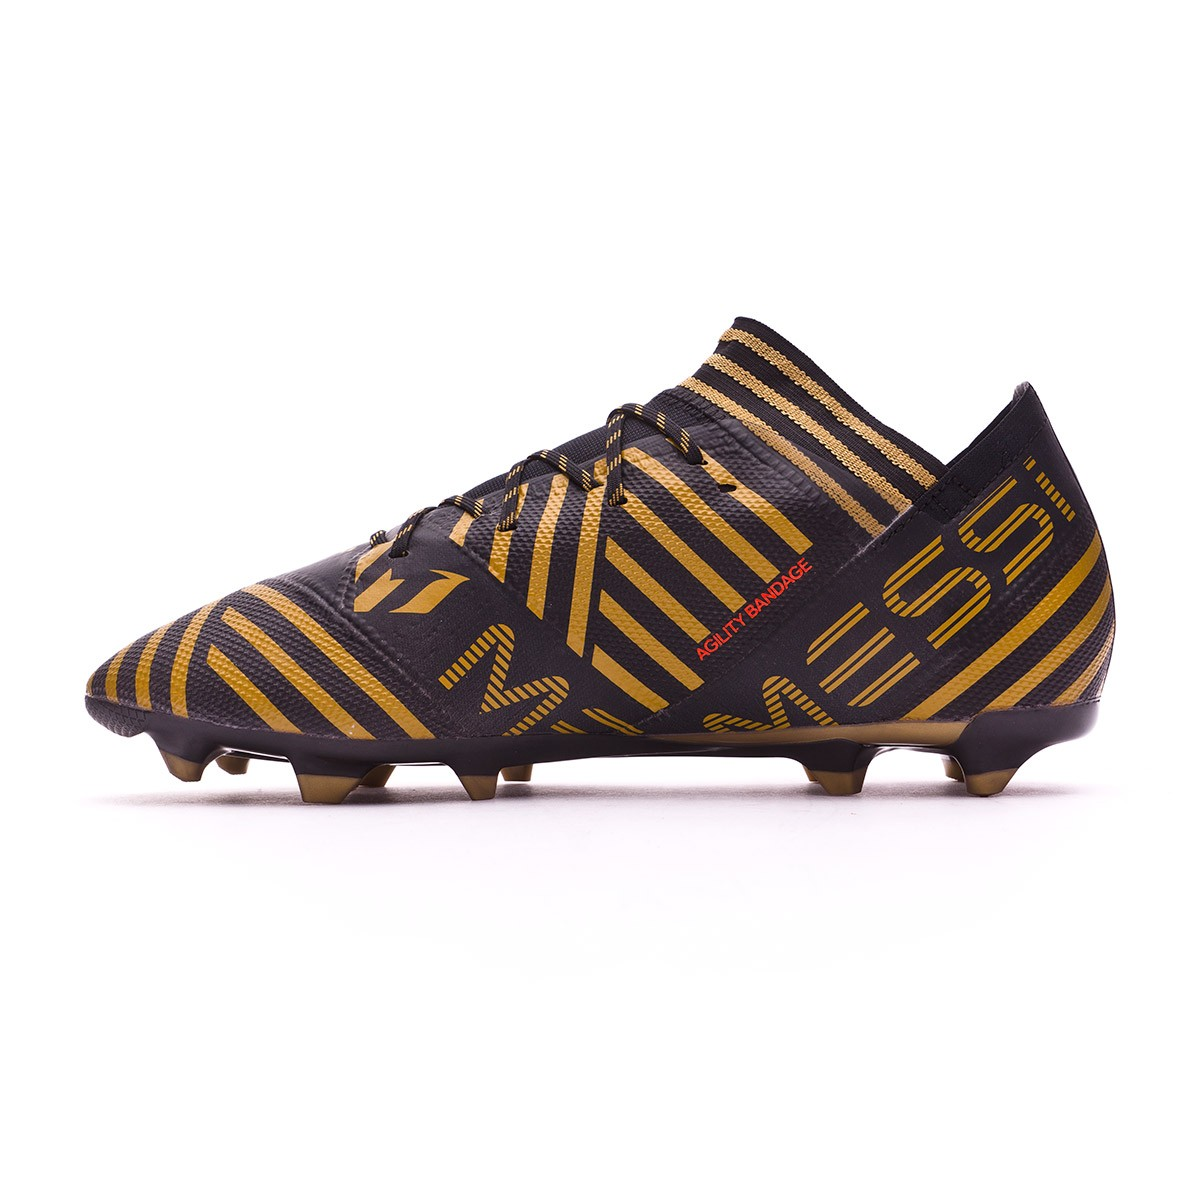 601c9654a Football Boots adidas Nemeziz Messi 17.2 FG Core black-Solar red-Tactile  gold metallic - Football store Fútbol Emotion